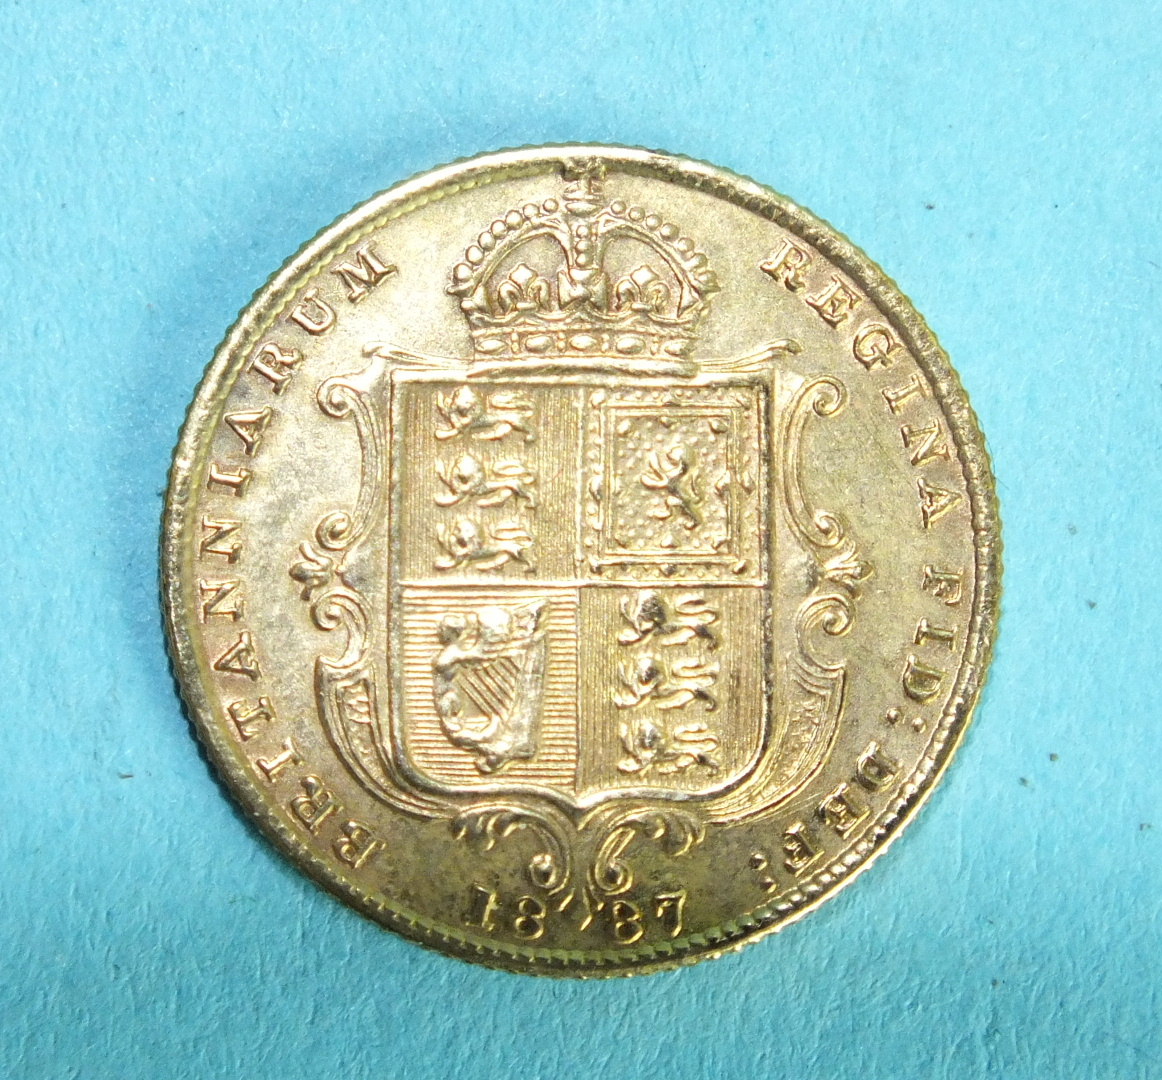 Lot 360 - A Queen Victoria 1887 half-sovereign, Jubilee head.